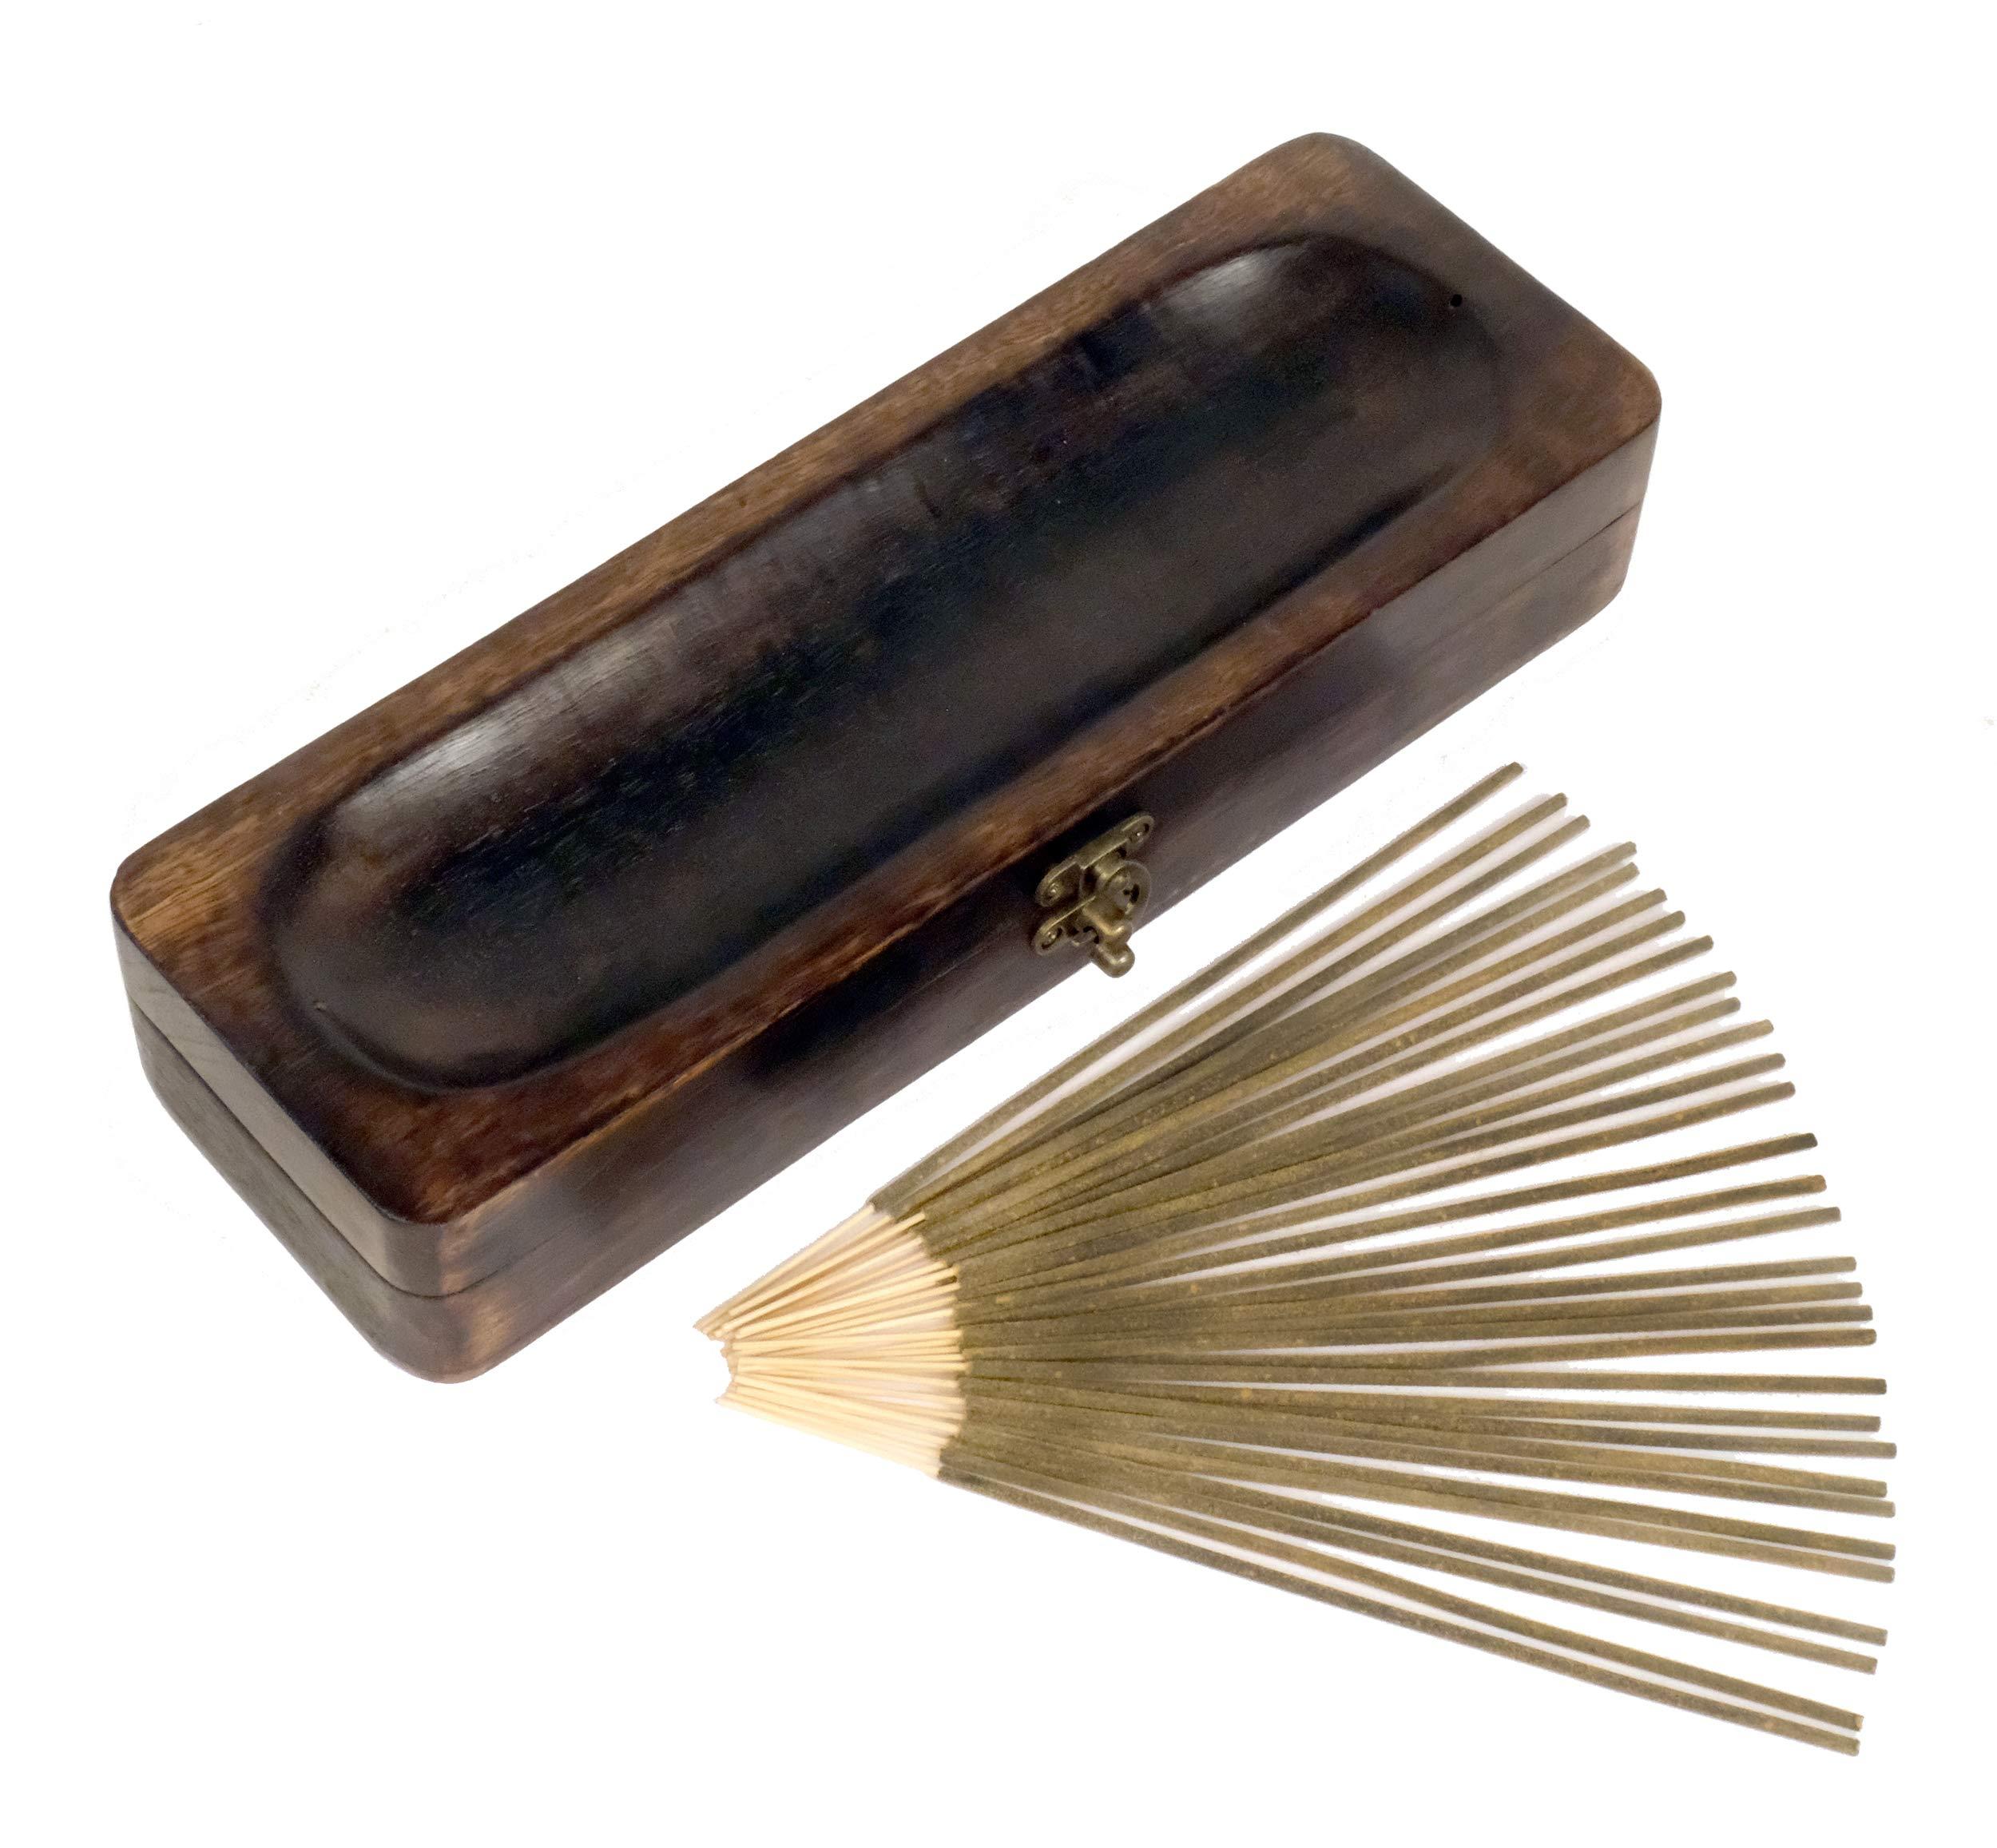 Natural Choice Incense Treasure Chest Incense Storage Box & Ash Catcher (Natural) by Natural Choice Incense (Image #2)